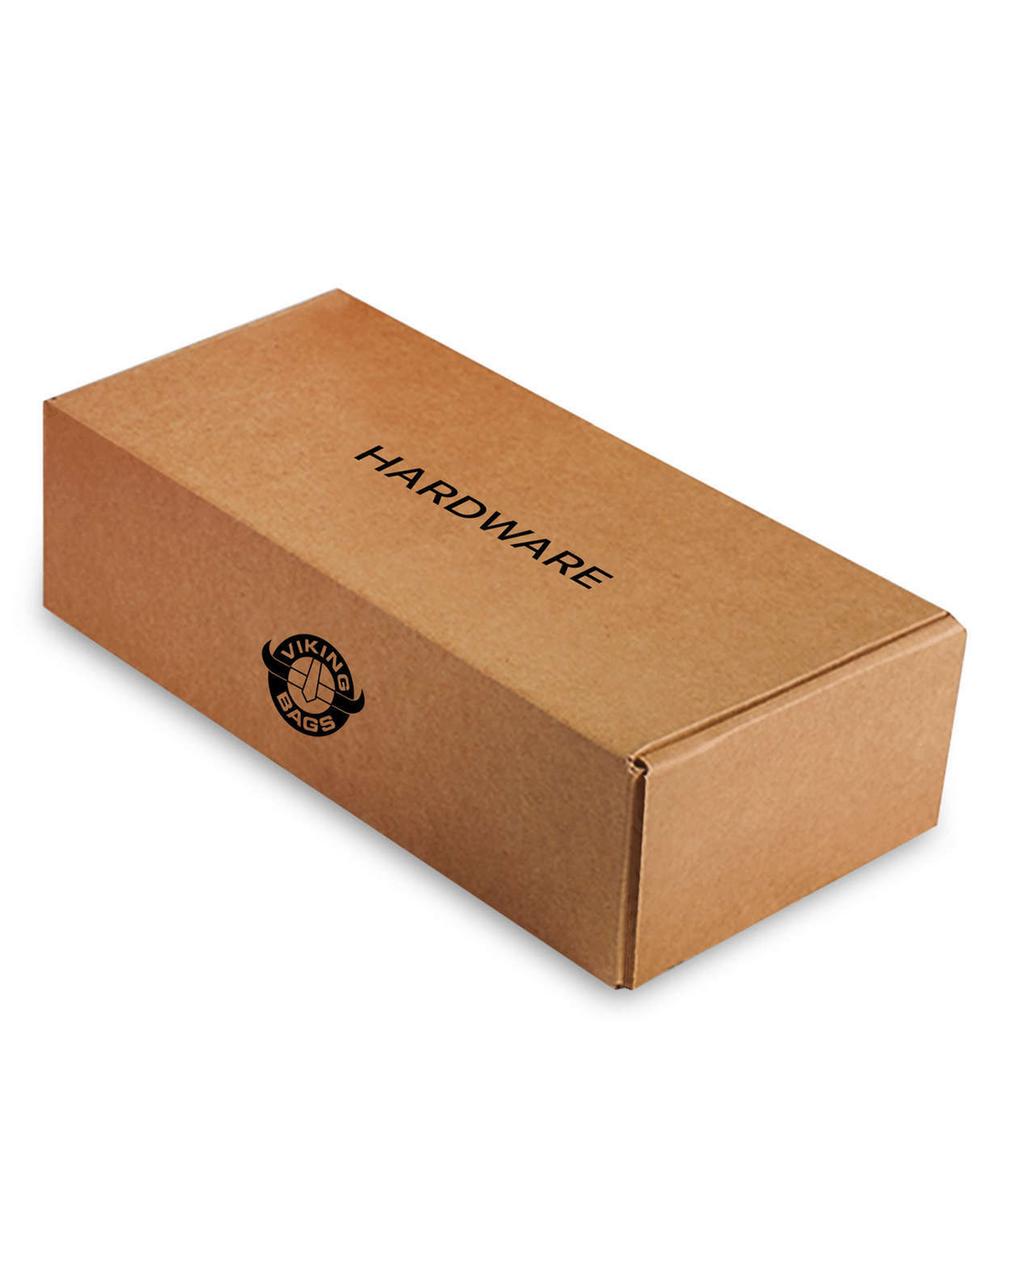 Honda VTX 1800 N Ultimate Shape Motorcycle Saddlebags Box